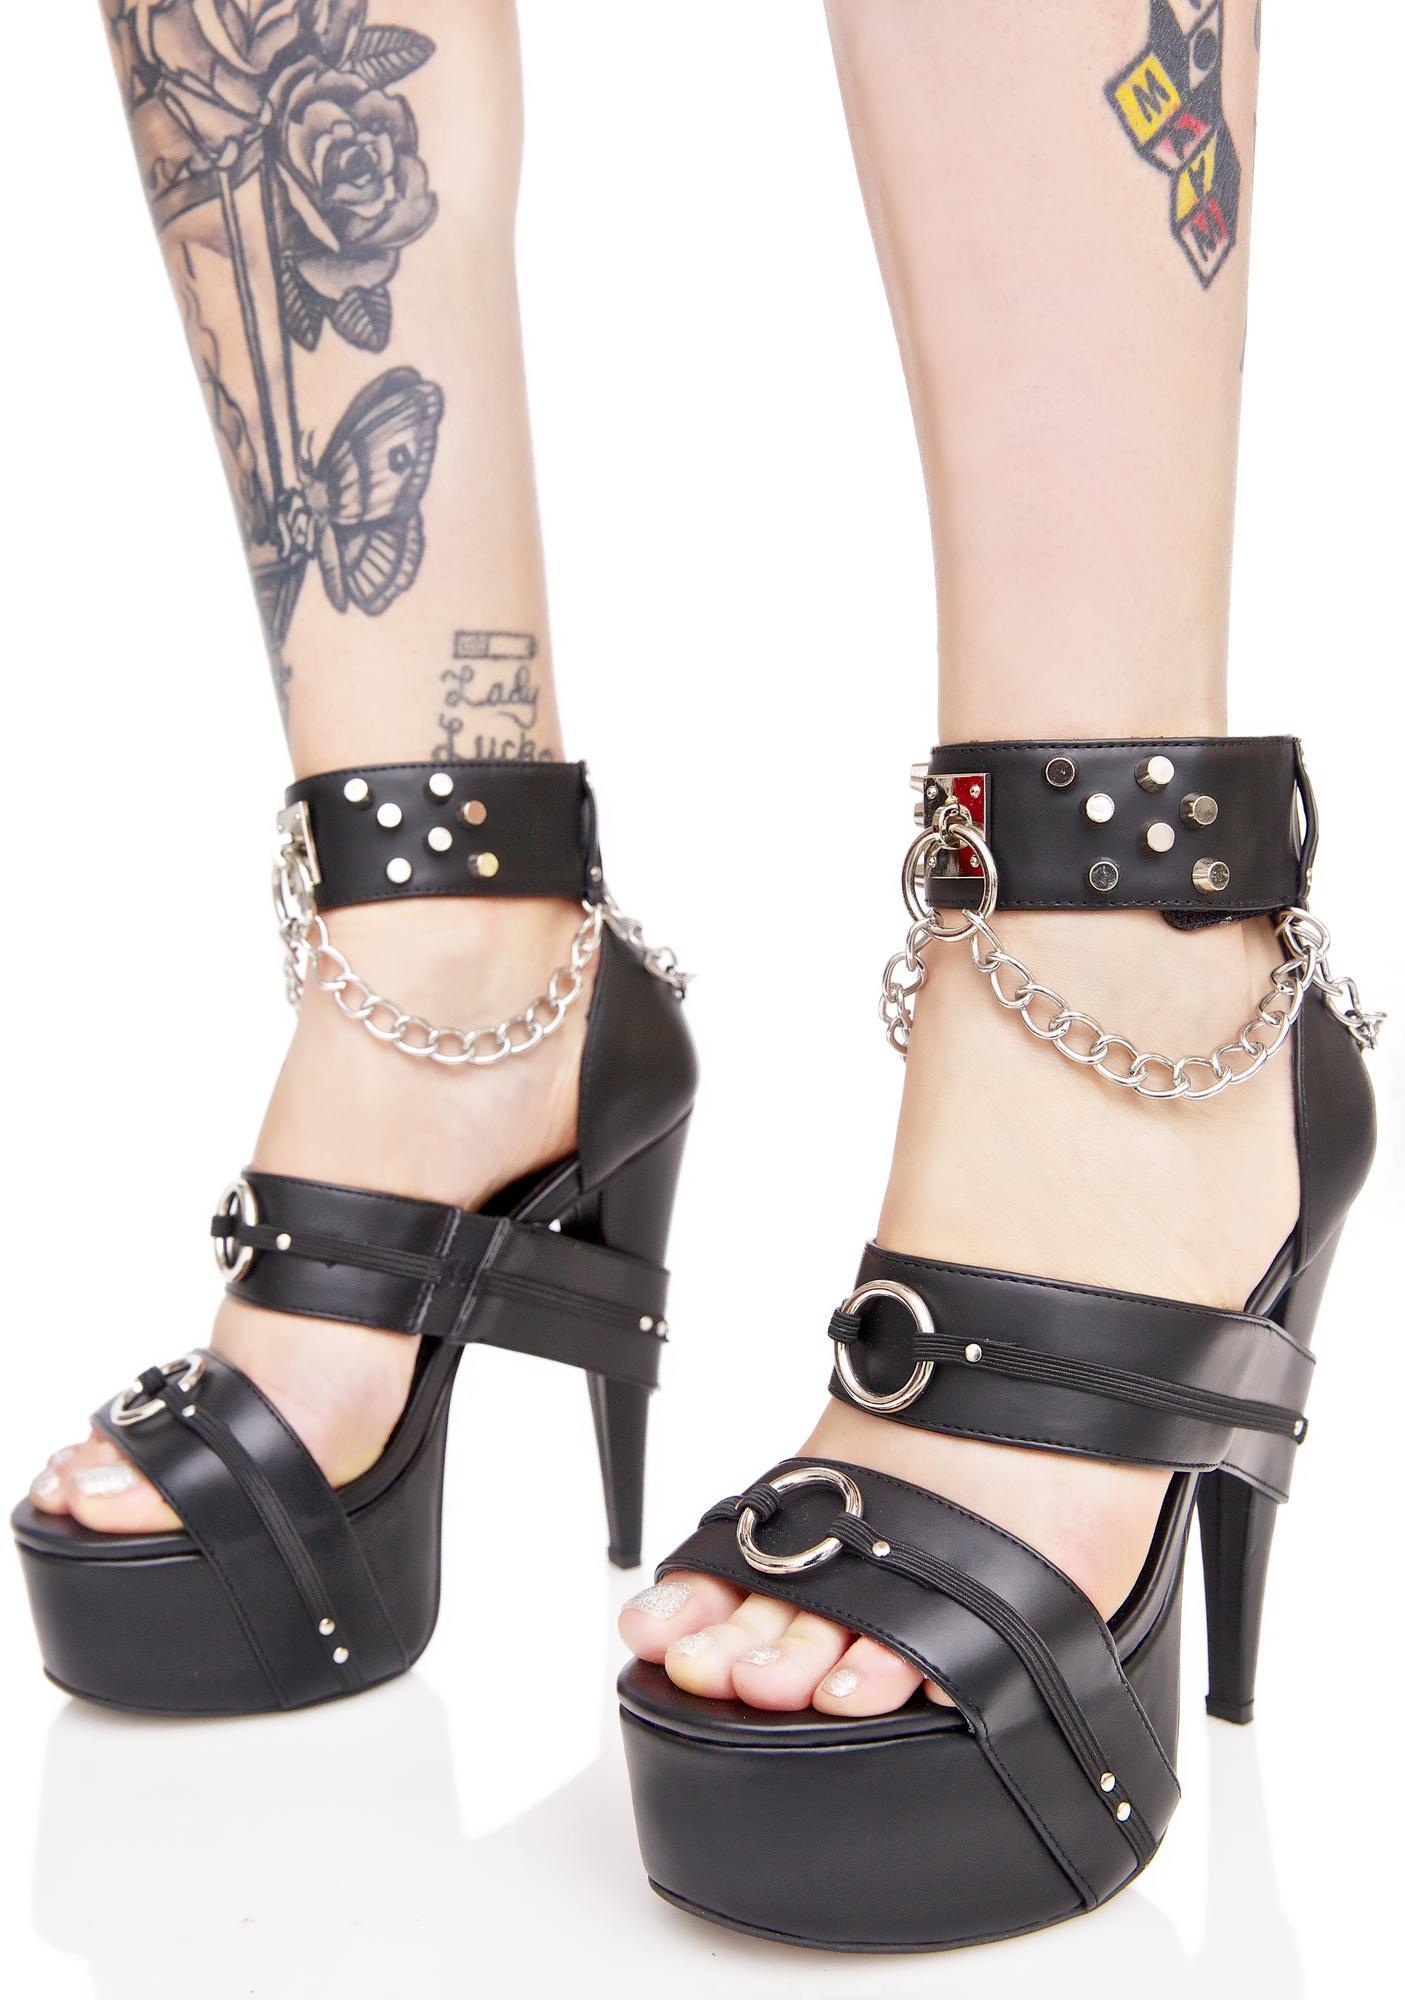 2a6743bdacf Current Mood Bondage Stiletto O-Ring Heels